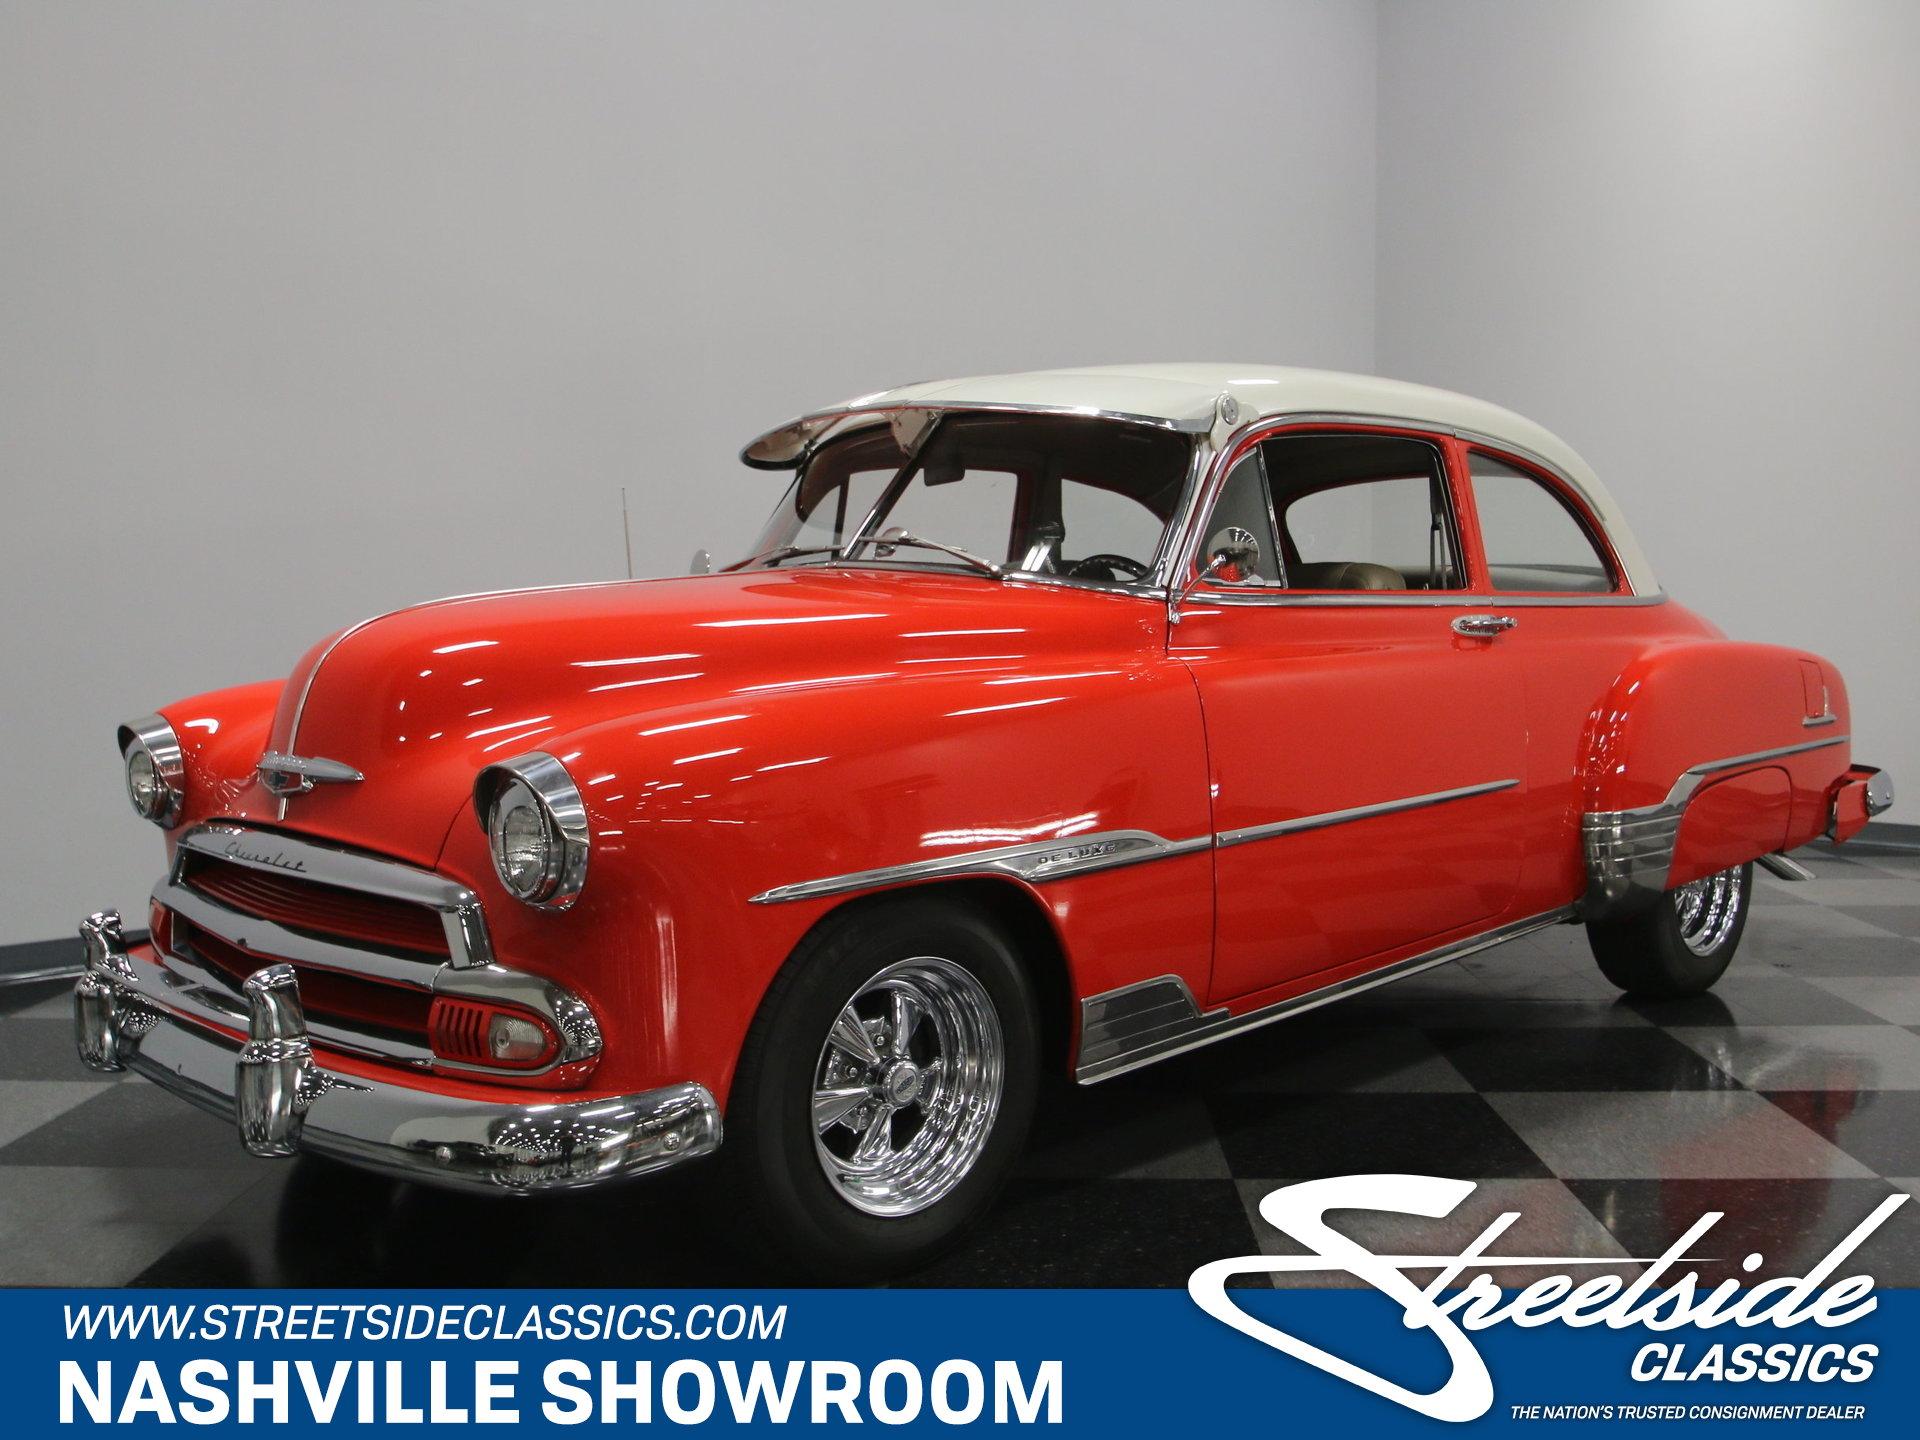 1951 Chevrolet Styleline Streetside Classics The Nations 2 Door Hardtop Play Video